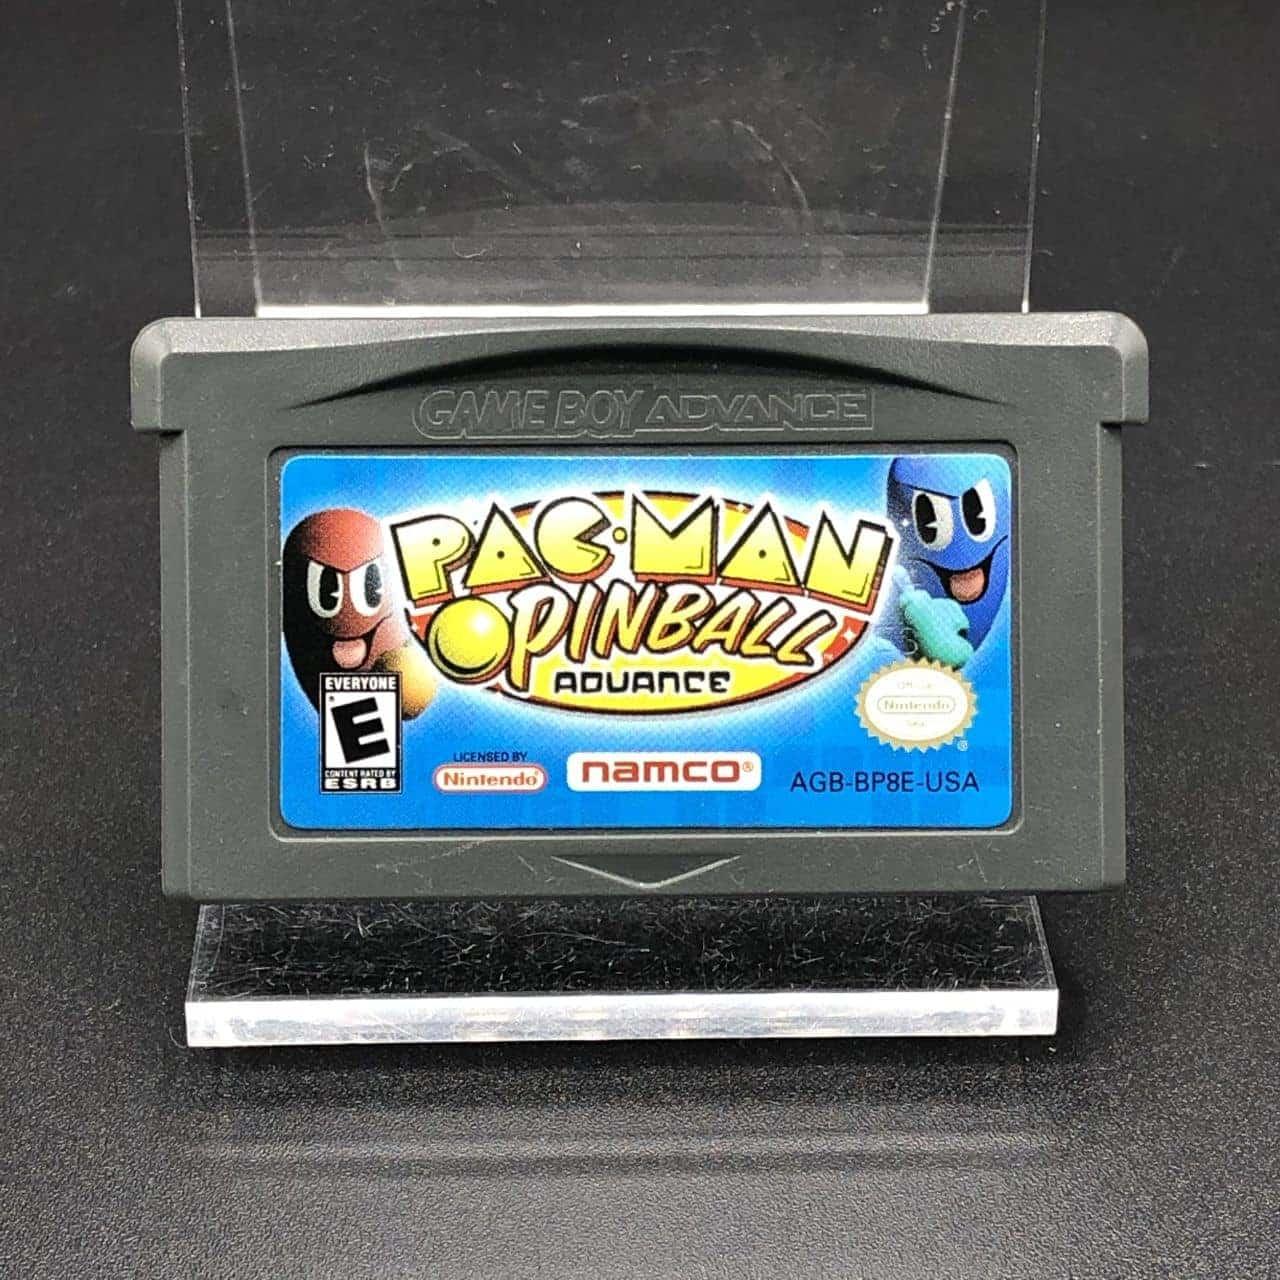 GBA Pac-Man Pinball Advance (Import USA) (Modul) (Sehr gut) Nintendo Game Boy Advance